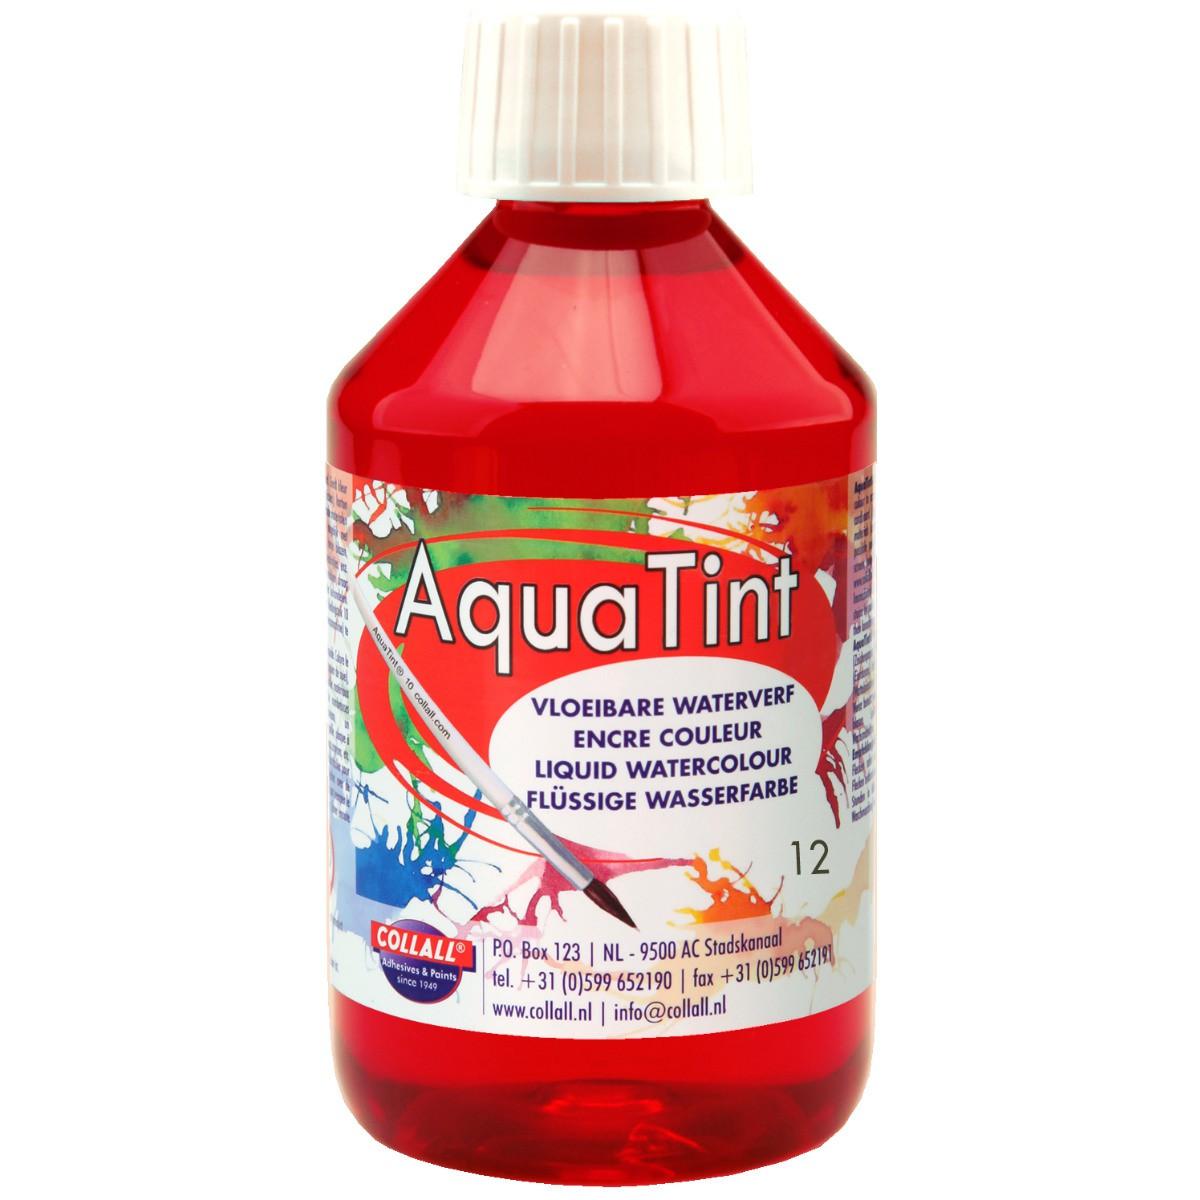 Flüssige Wasserfarbe AquaTint - Farbe dunkelrot - 250ml Flasche